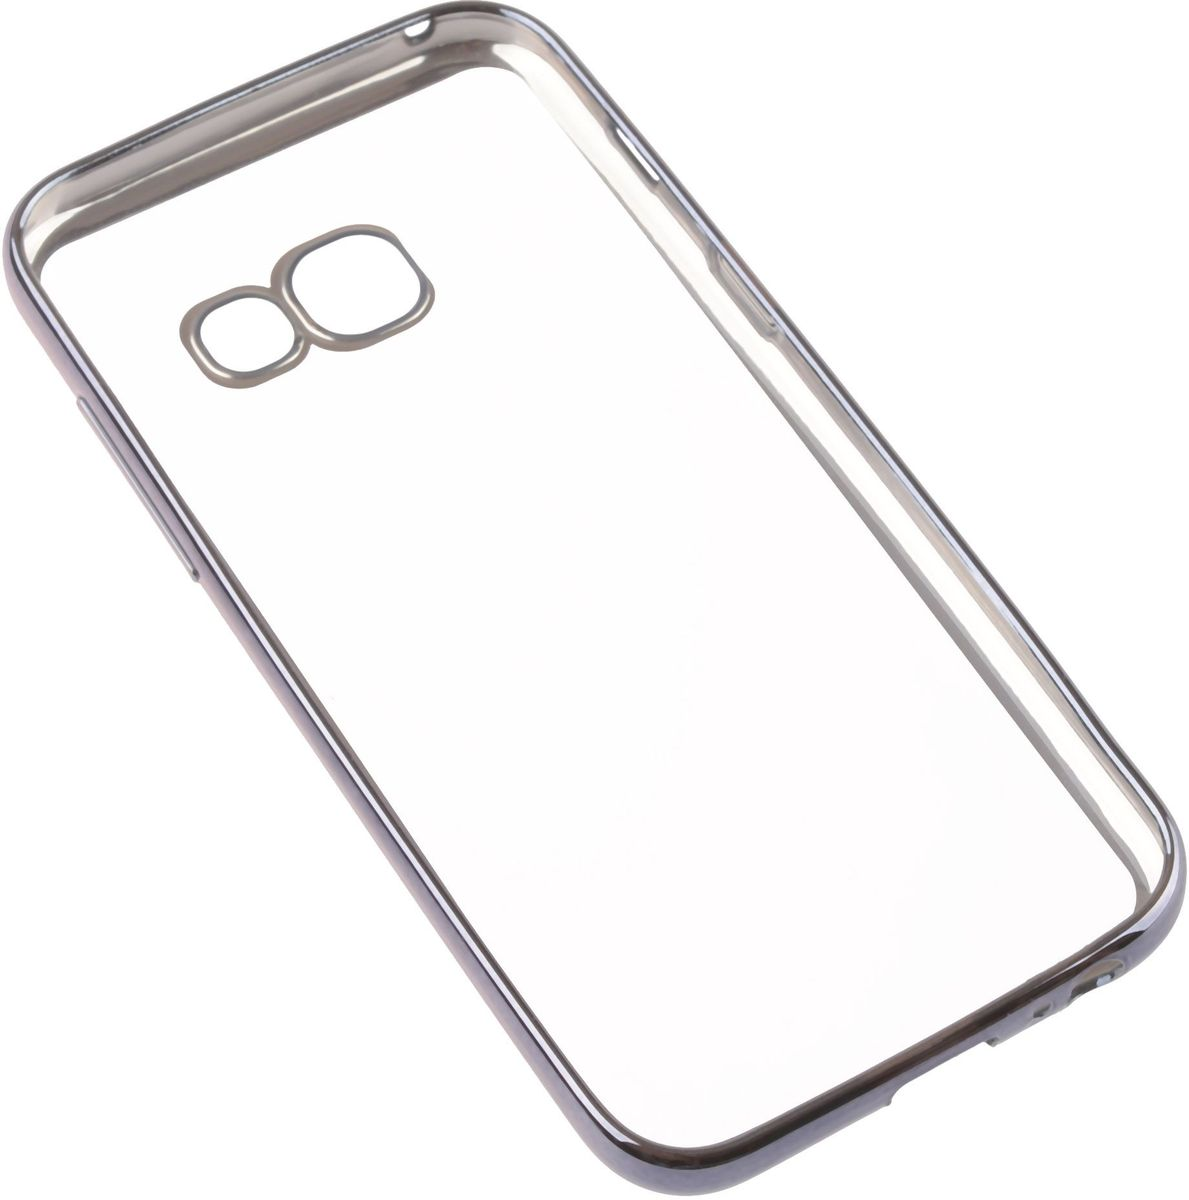 Skinbox 4People Silicone Chrome Borderчехол для Samsung Galaxy A3 (2017), Dark Silver Skinbox